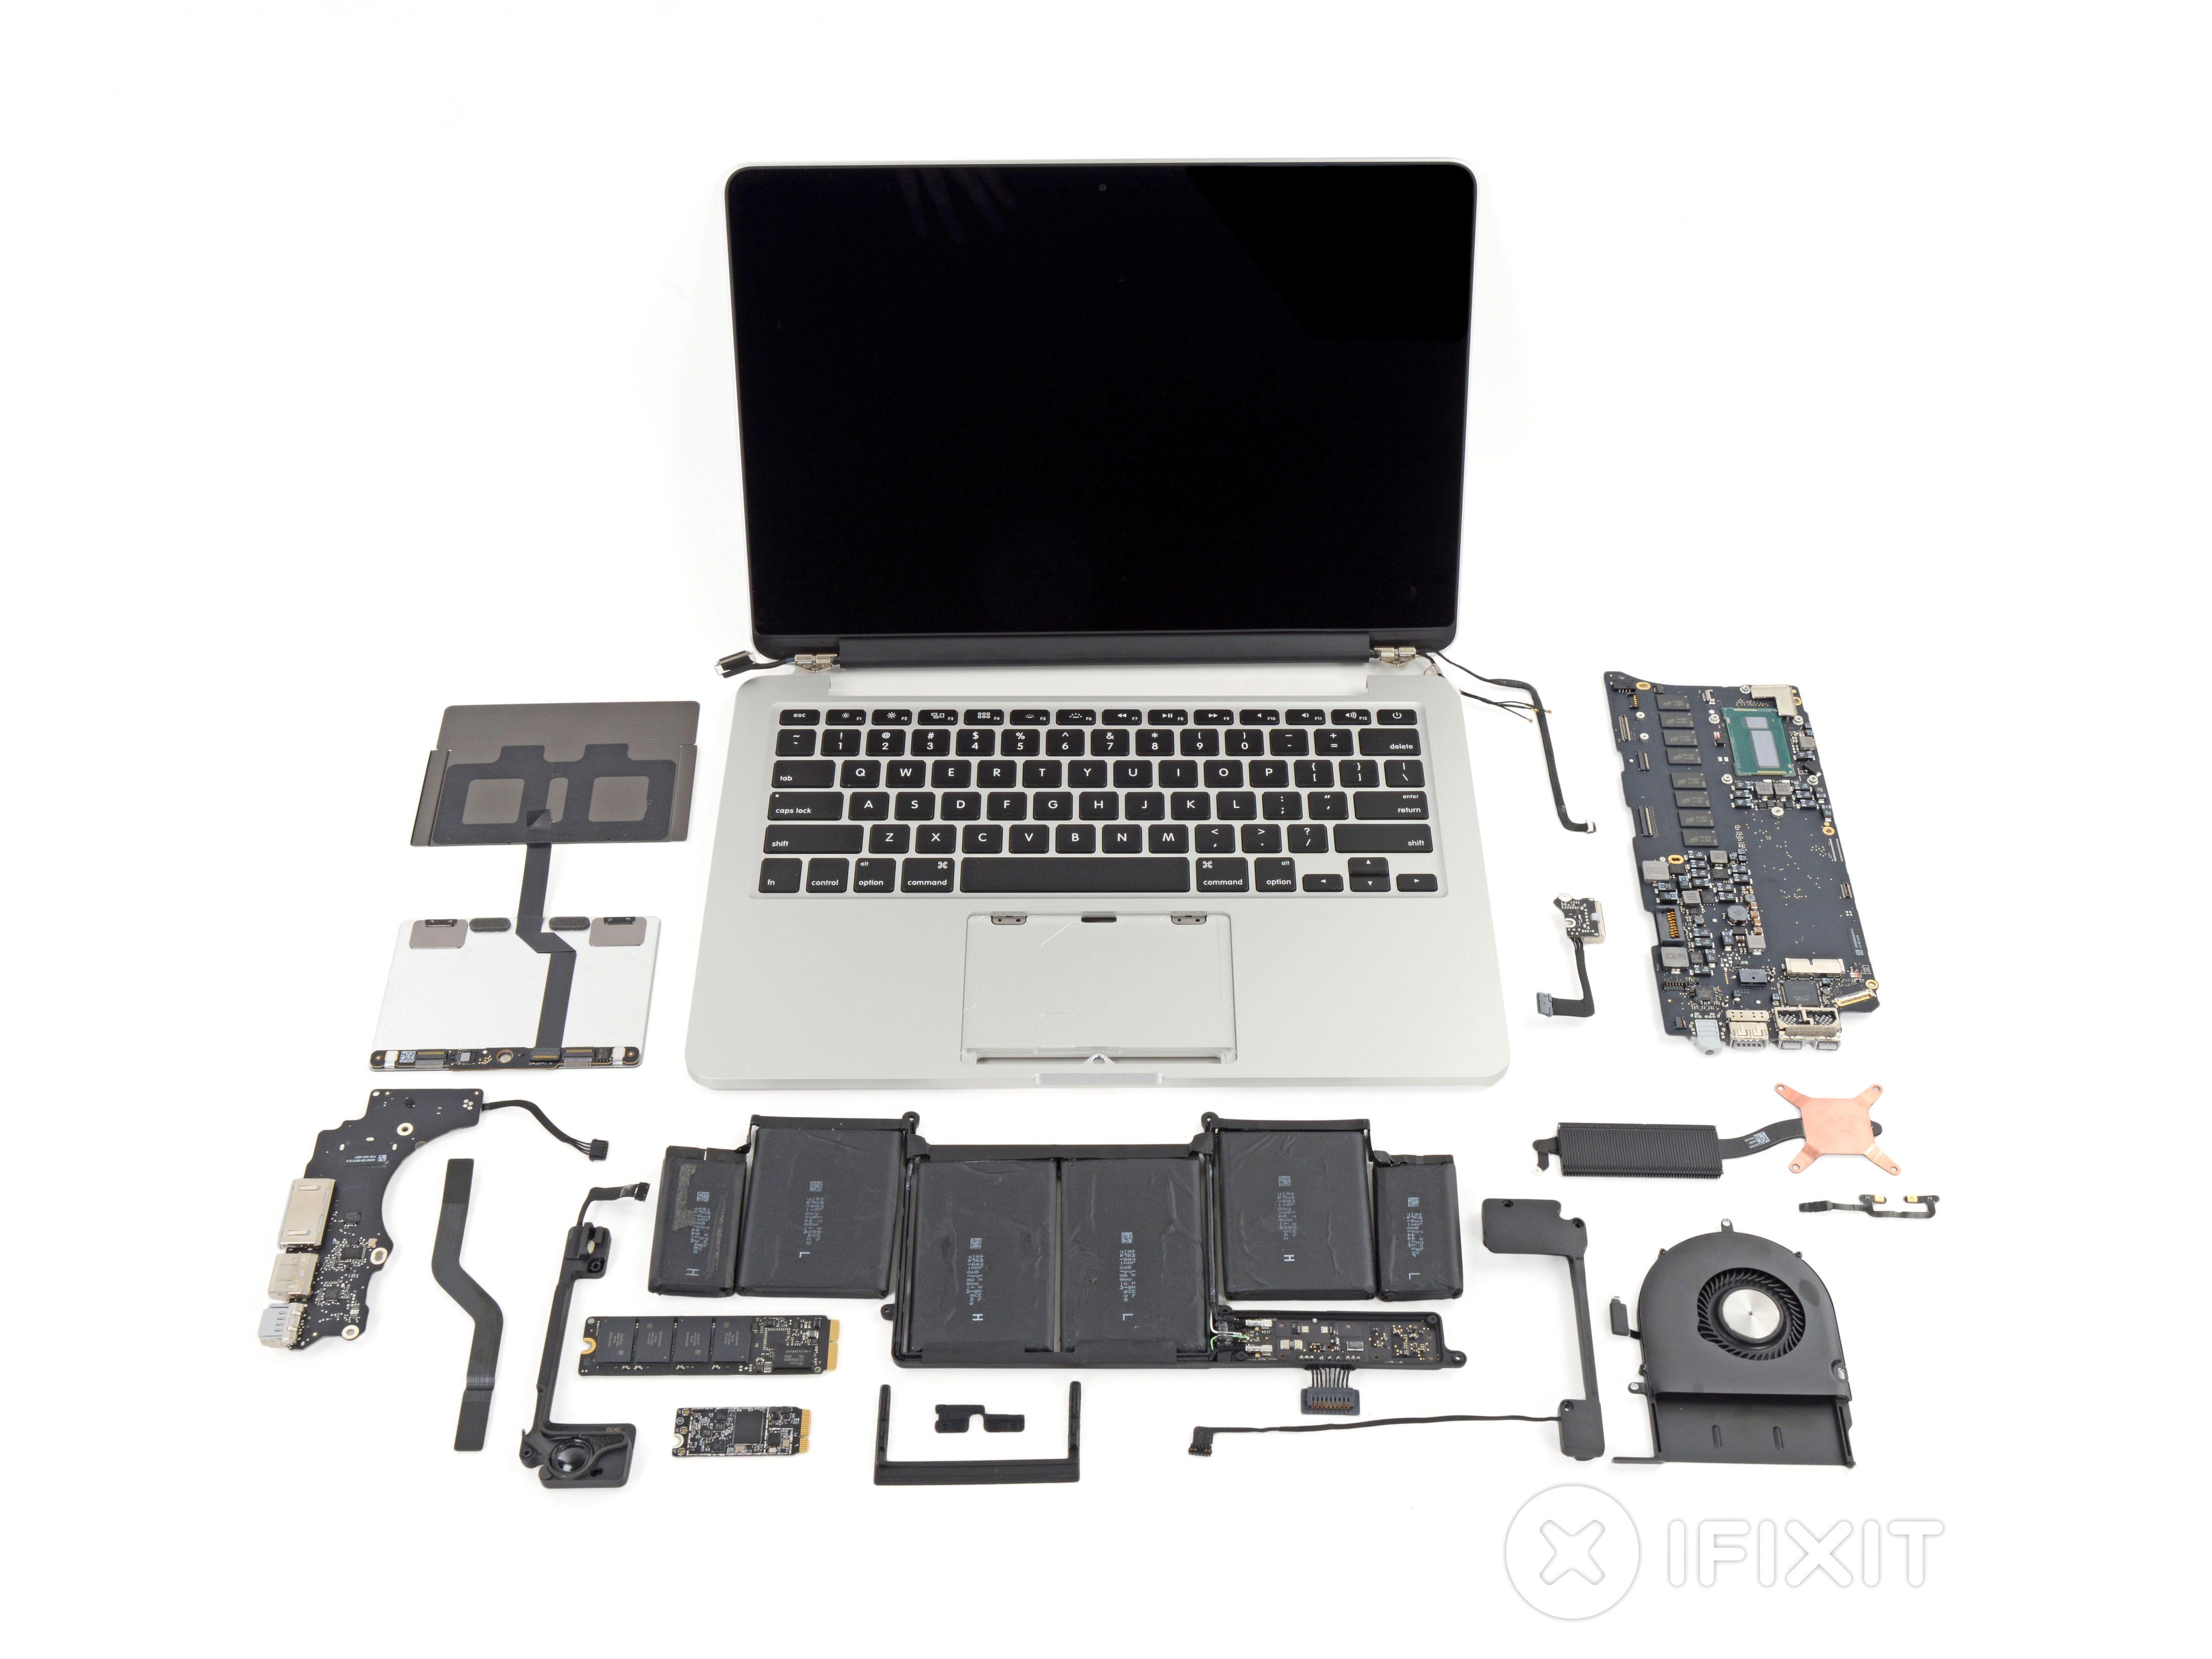 Macbook Pro 13 Retina Display Late 2013 Teardown Macbook Pro